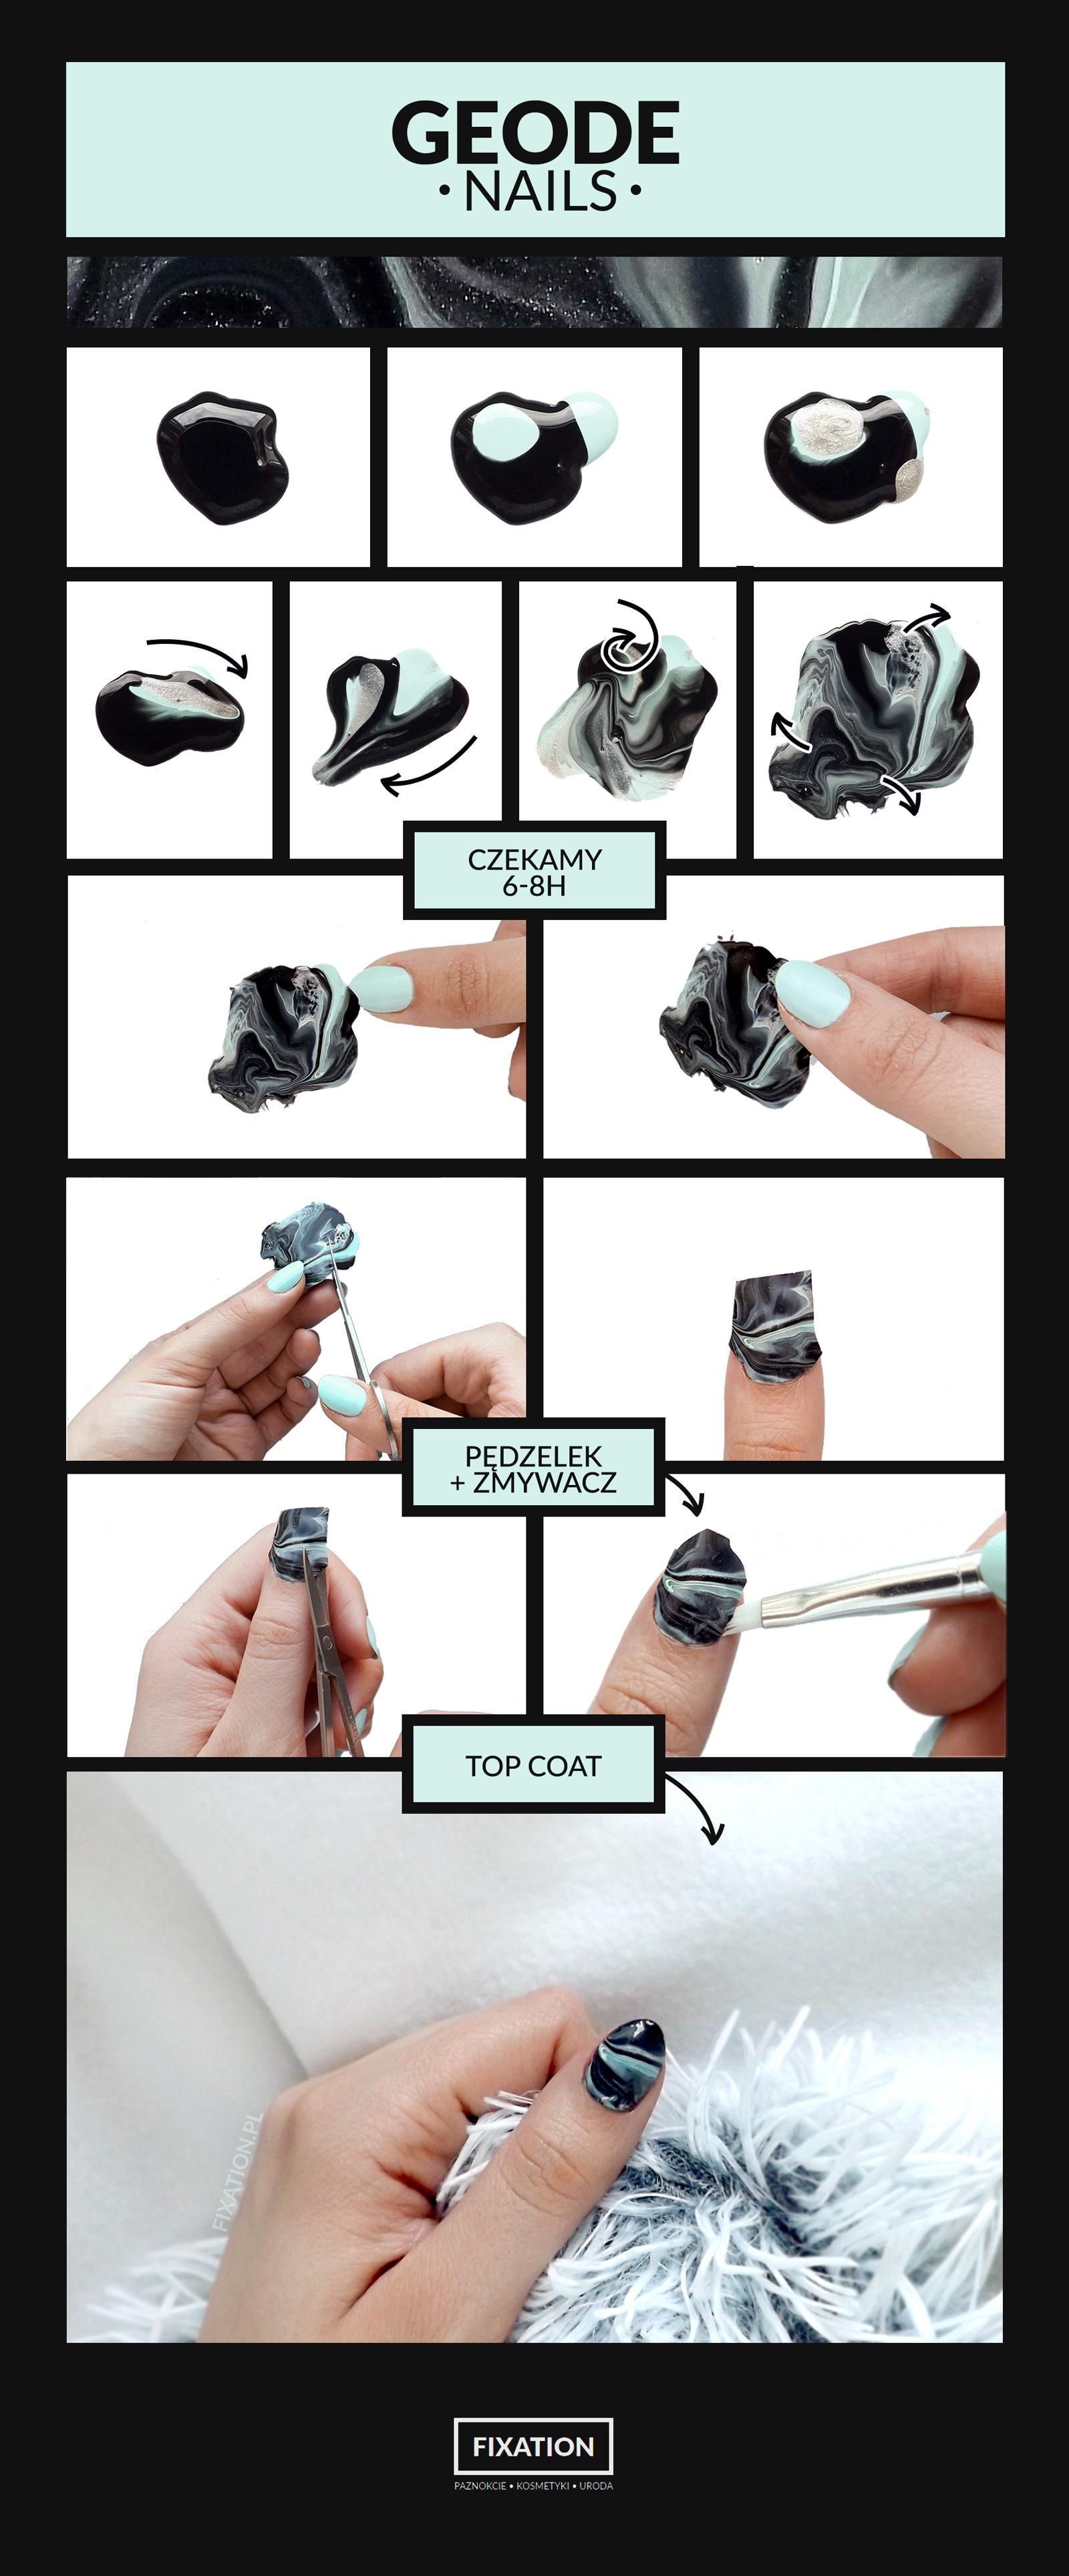 Miętowo - srebrne geode nails | Suche marble - tutorial krok po kroku